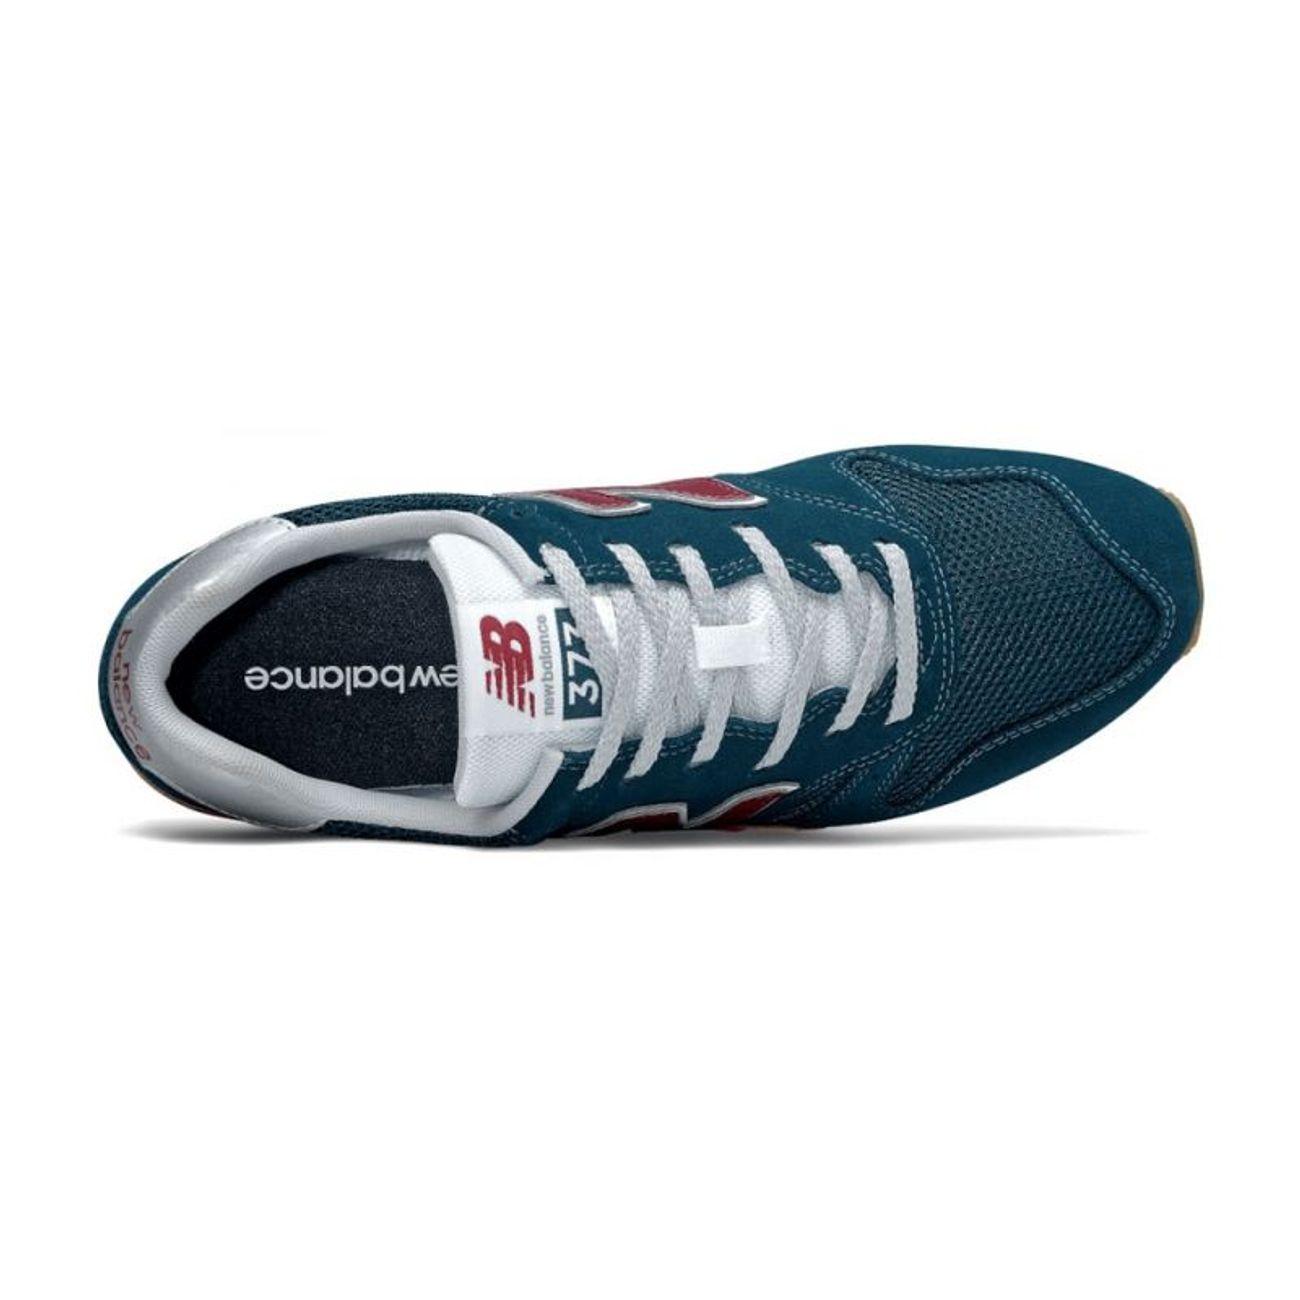 Mode- Lifestyle homme NEW BALANCE Baskets Bleues Homme New Balance ML373 D